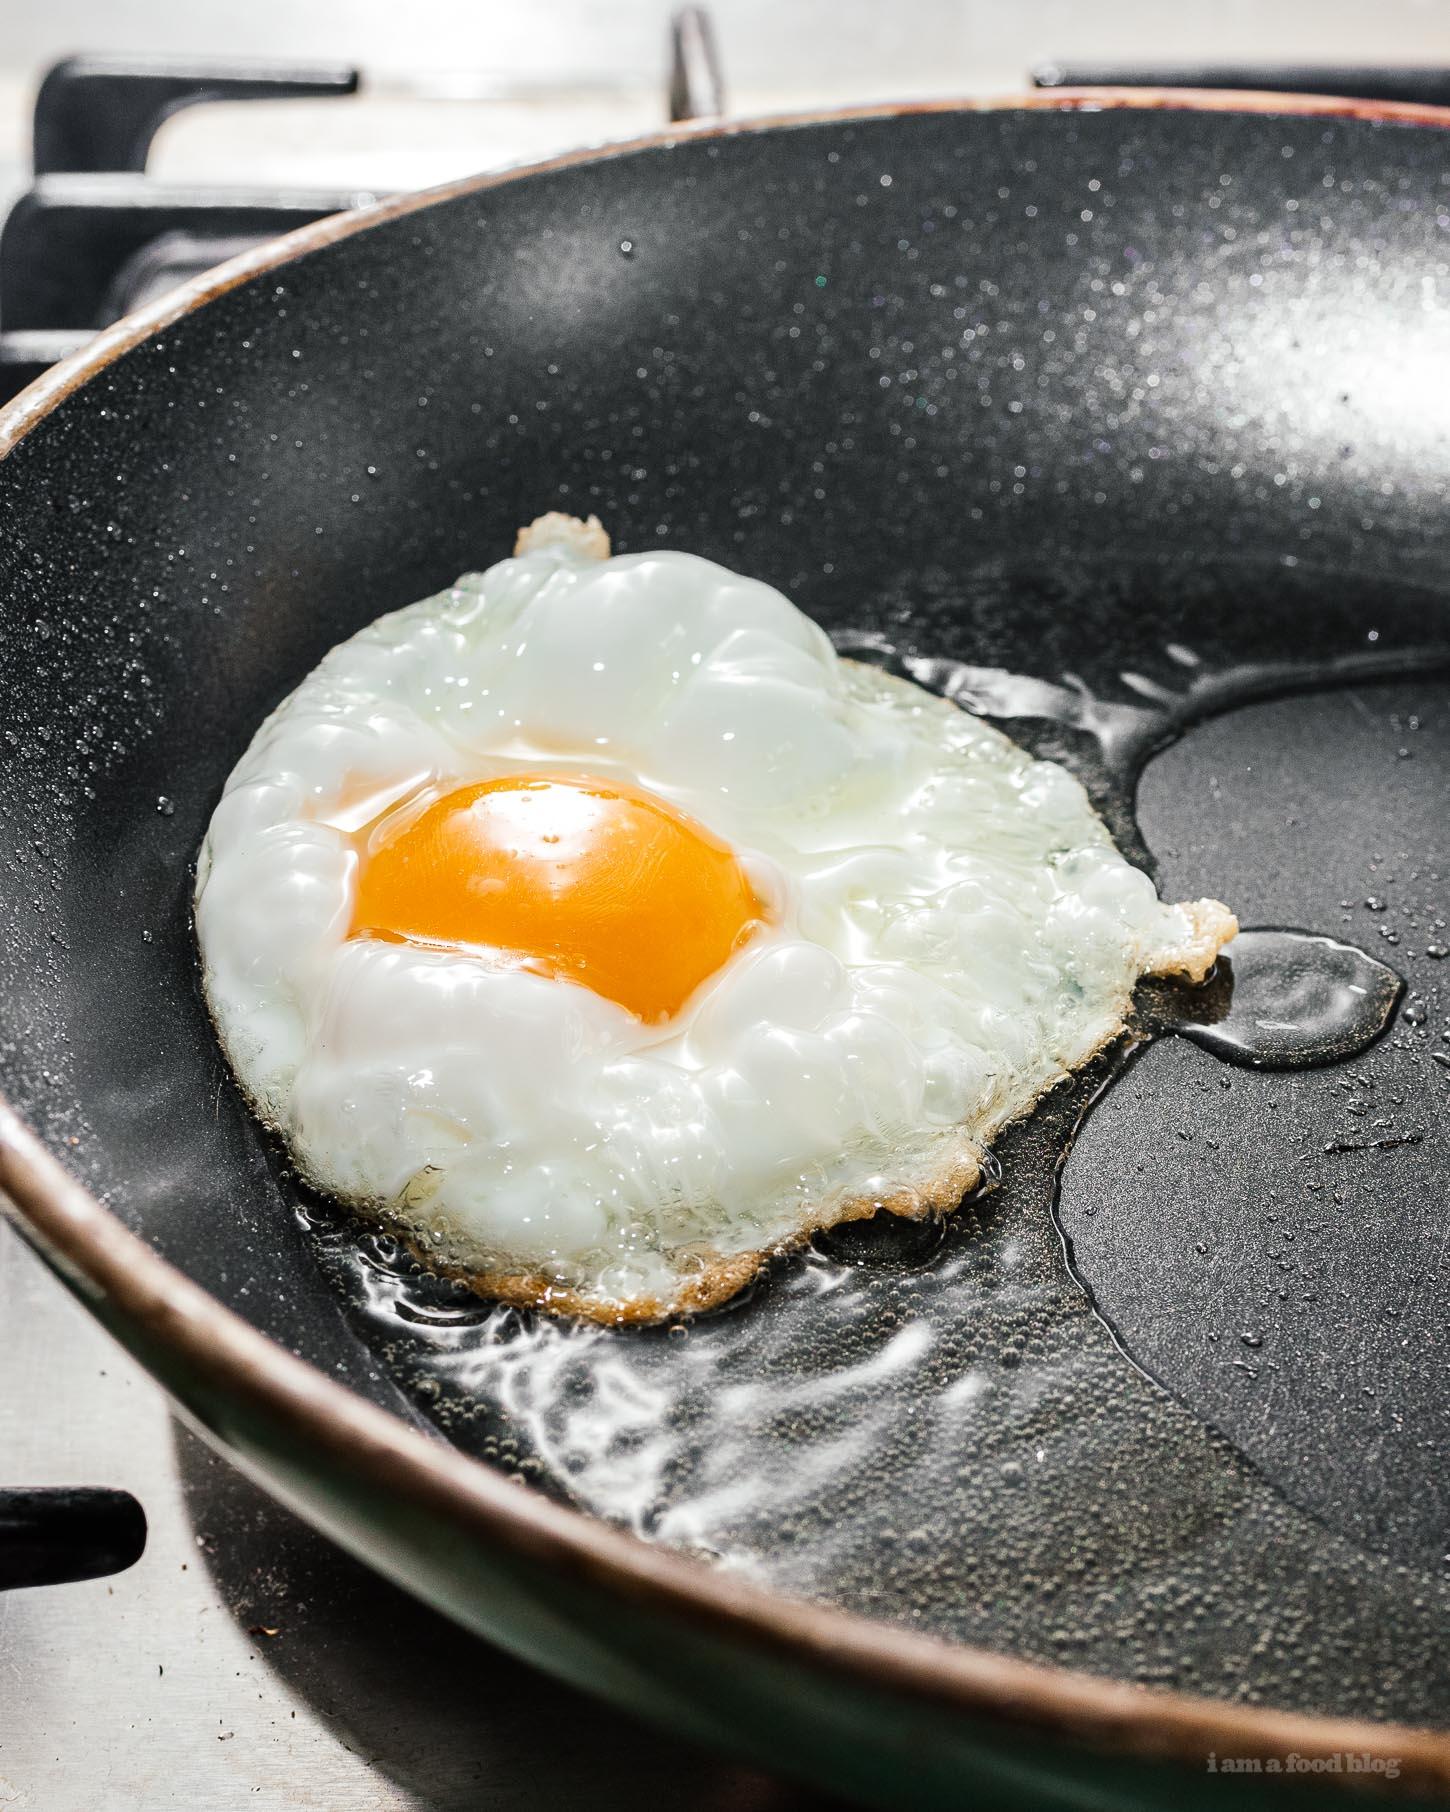 How to Make Crispy Fried Eggs